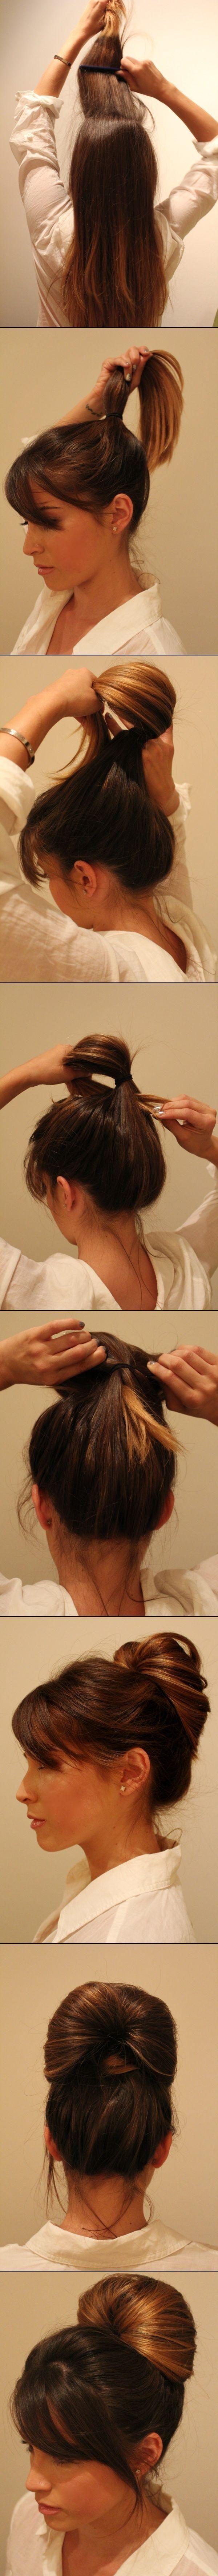 So much cuter than a ponytail. Love this!